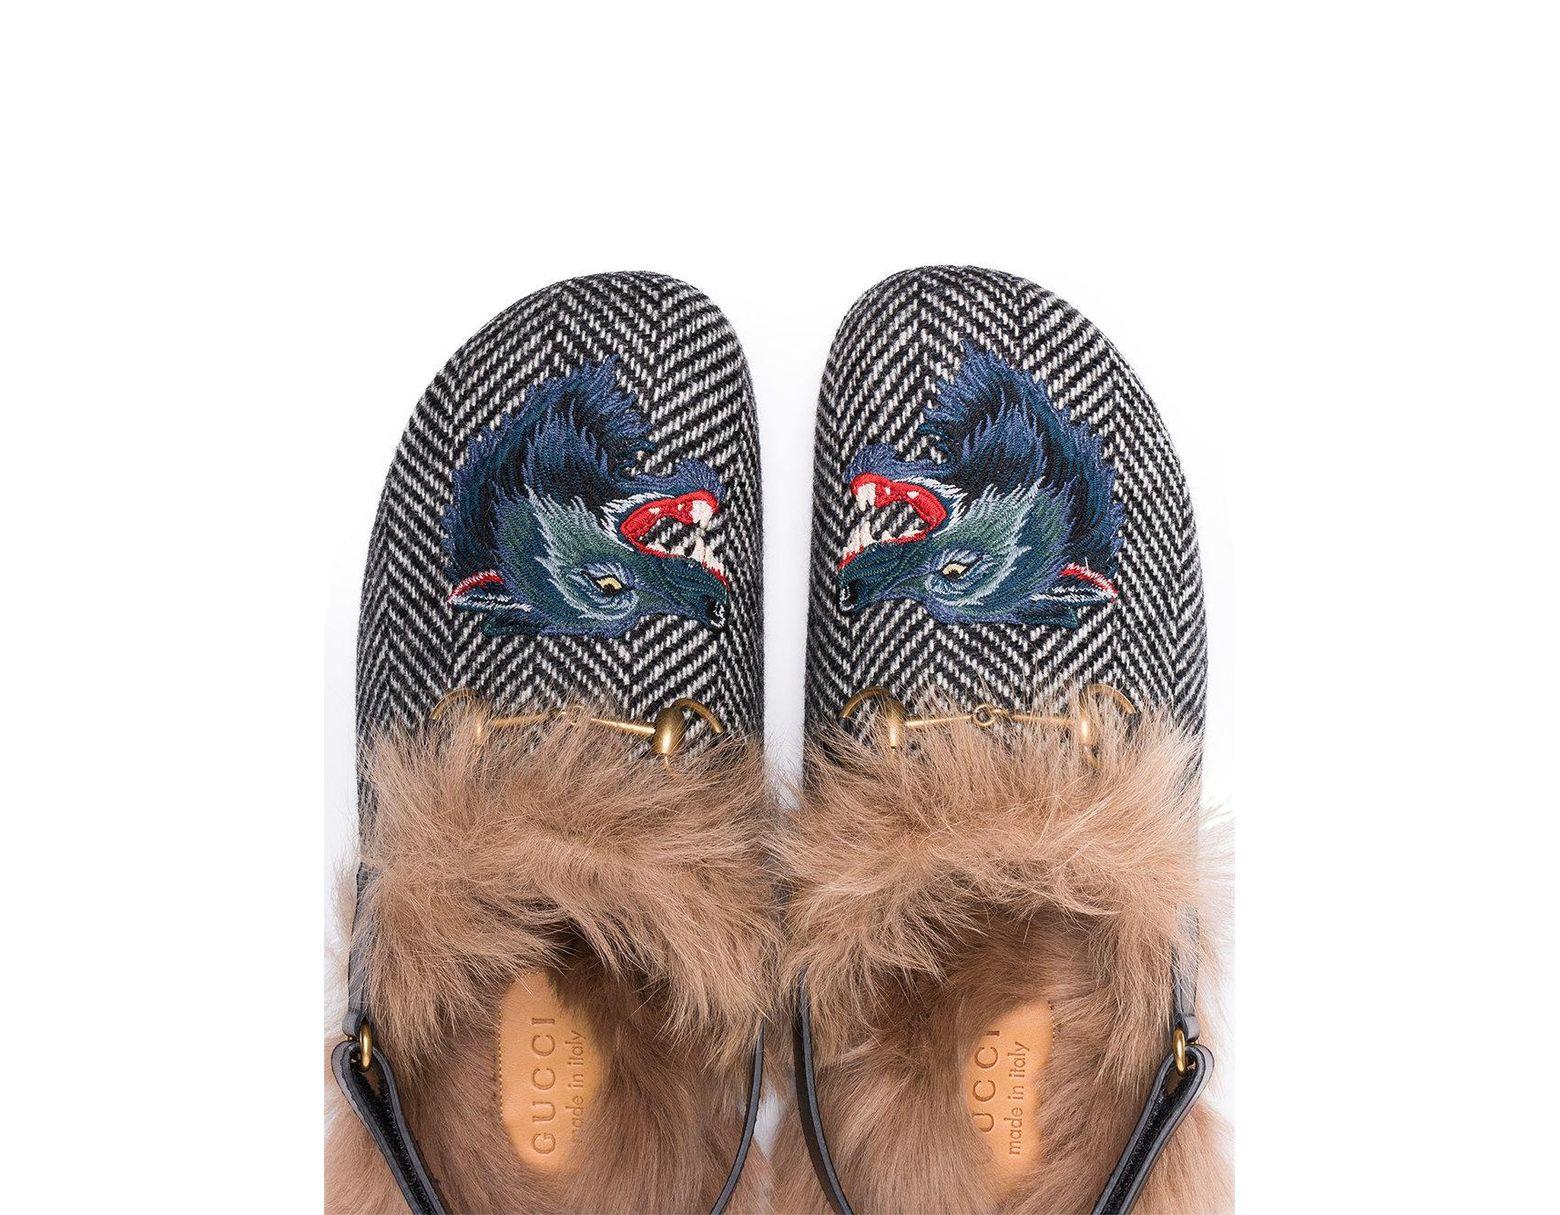 dfe6e3a9387 Lyst - Gucci Fur Herringbone Slippers With Wolf Head in Black for Men